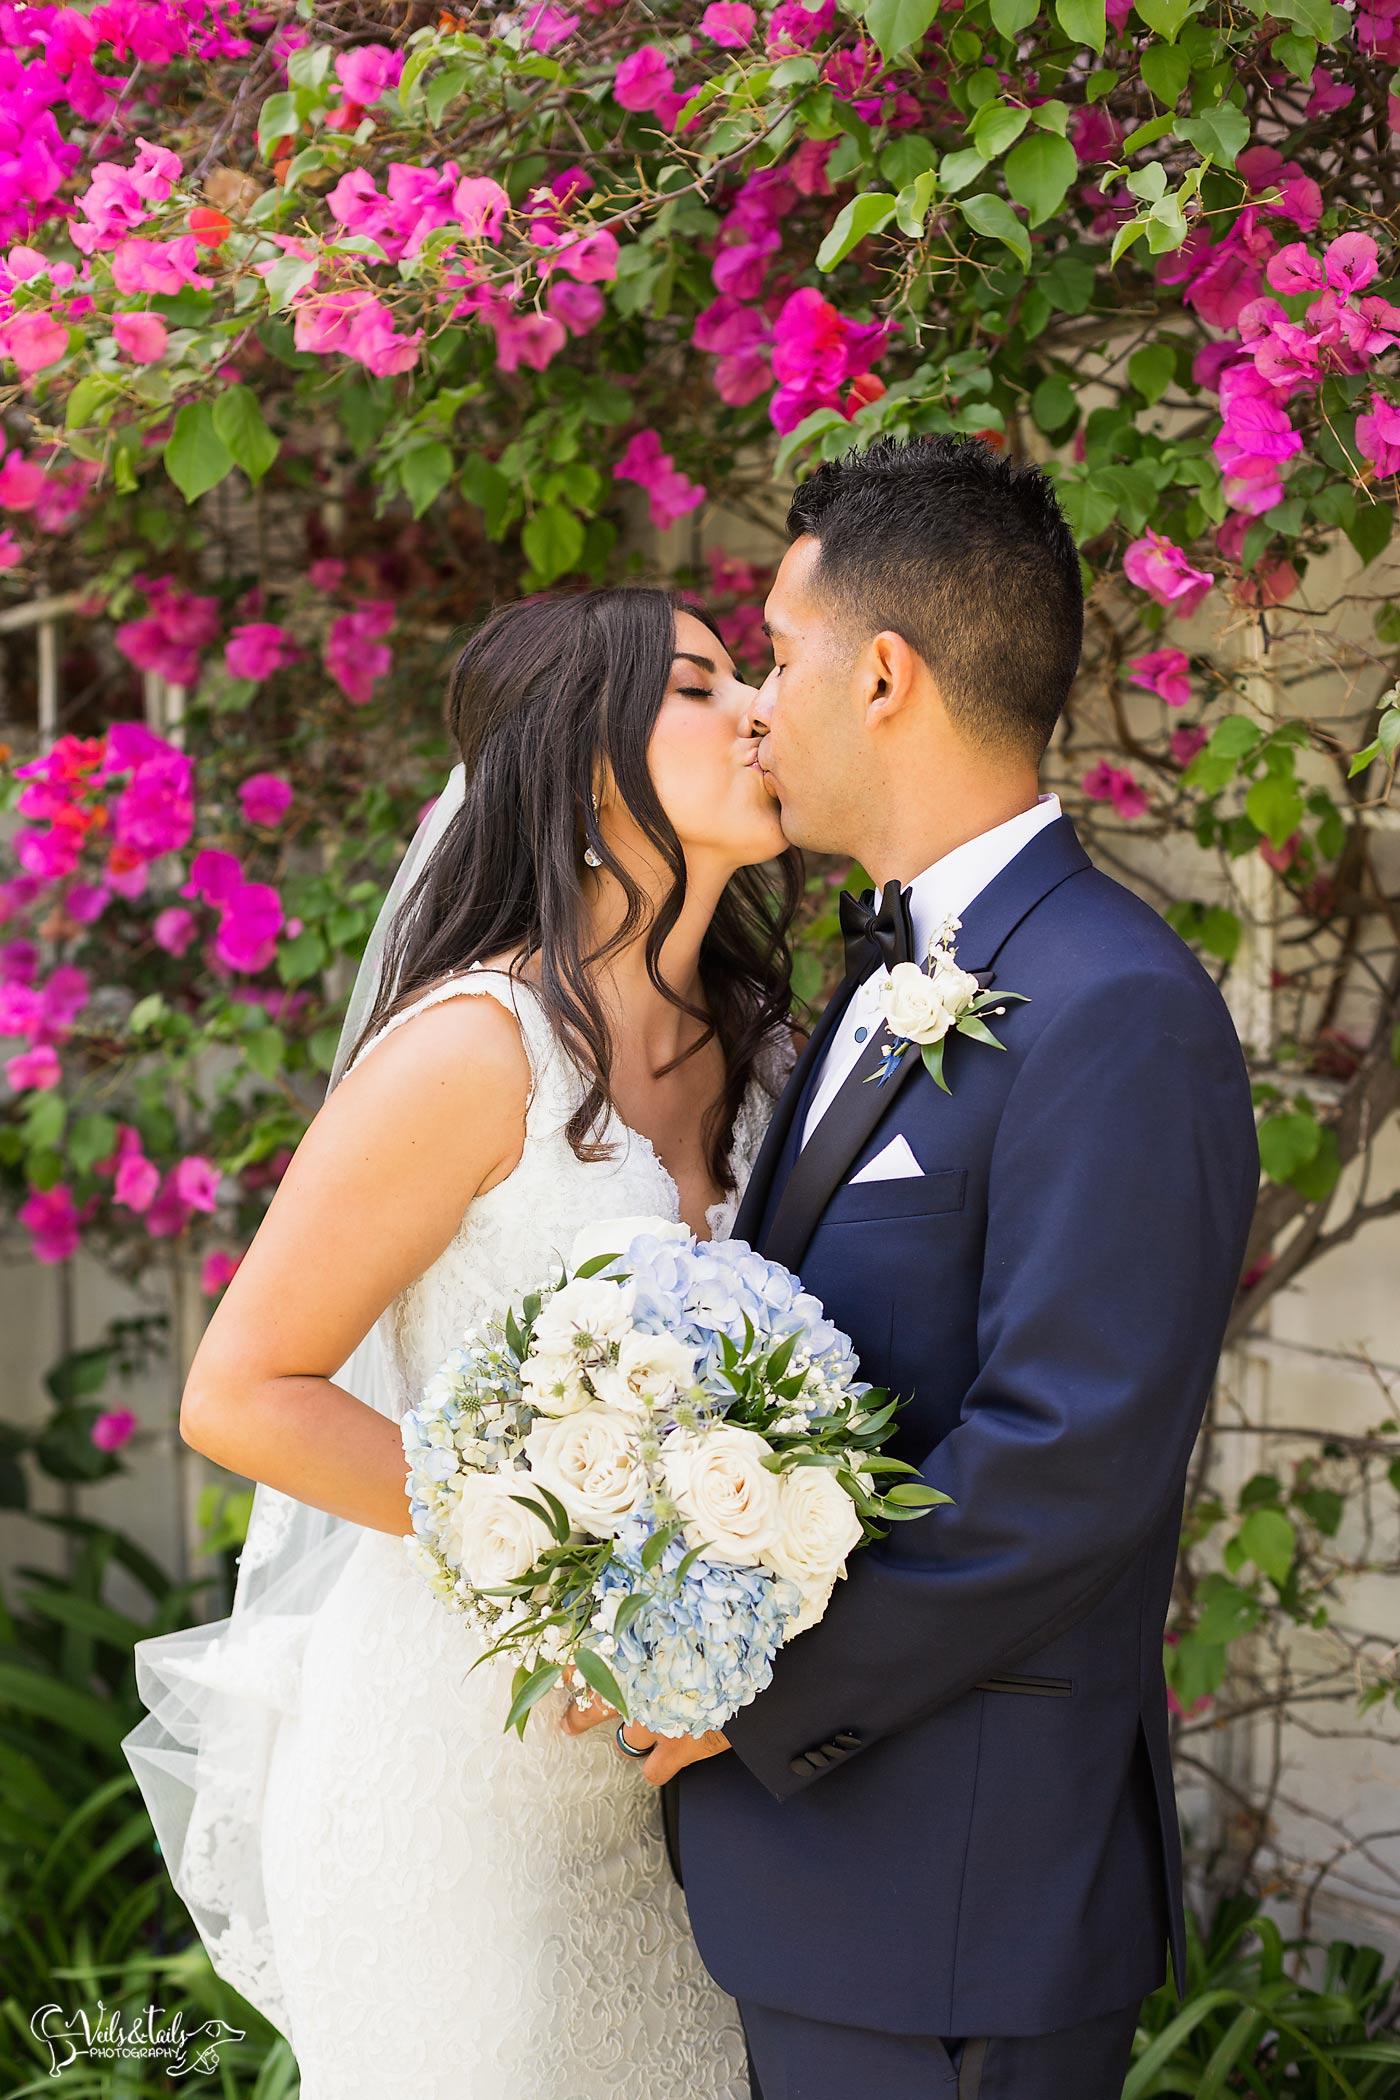 Our Lady of Sorrows Santa Barbara Wedding Photographer